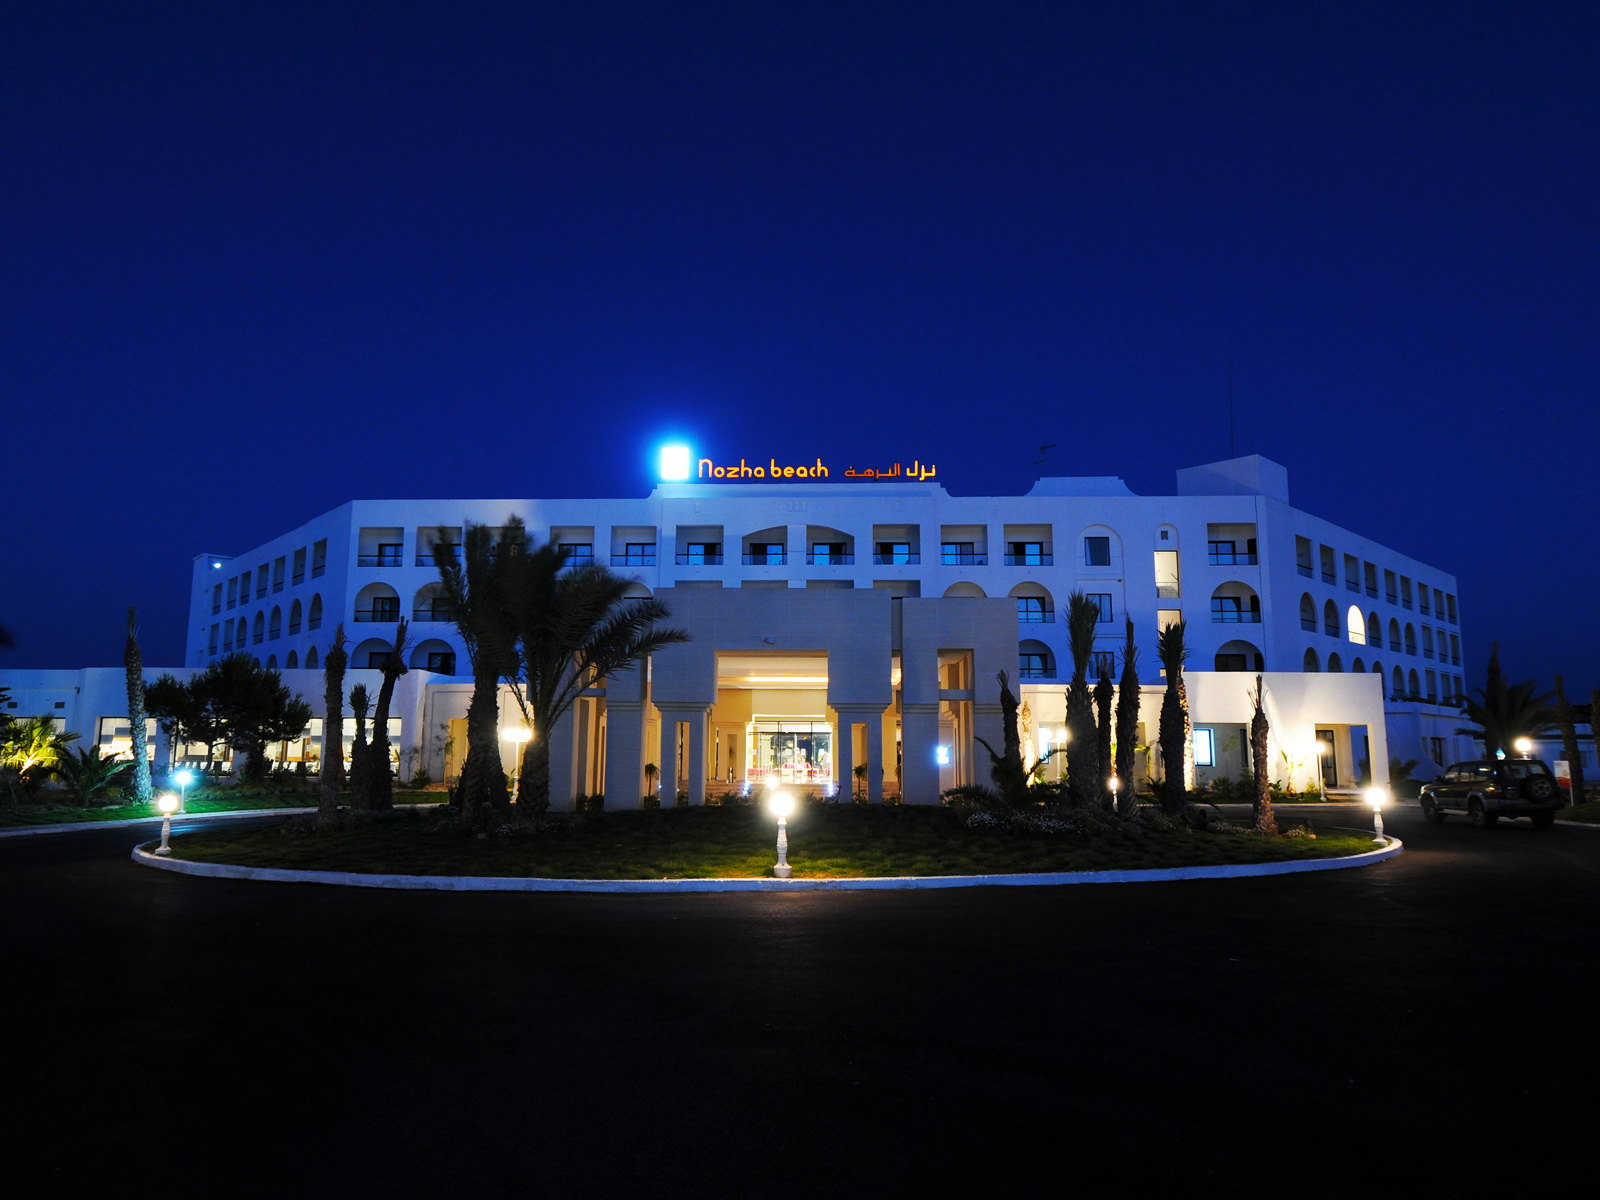 Entrada Principal Noche - Hamammet Nozha Beach Hotel